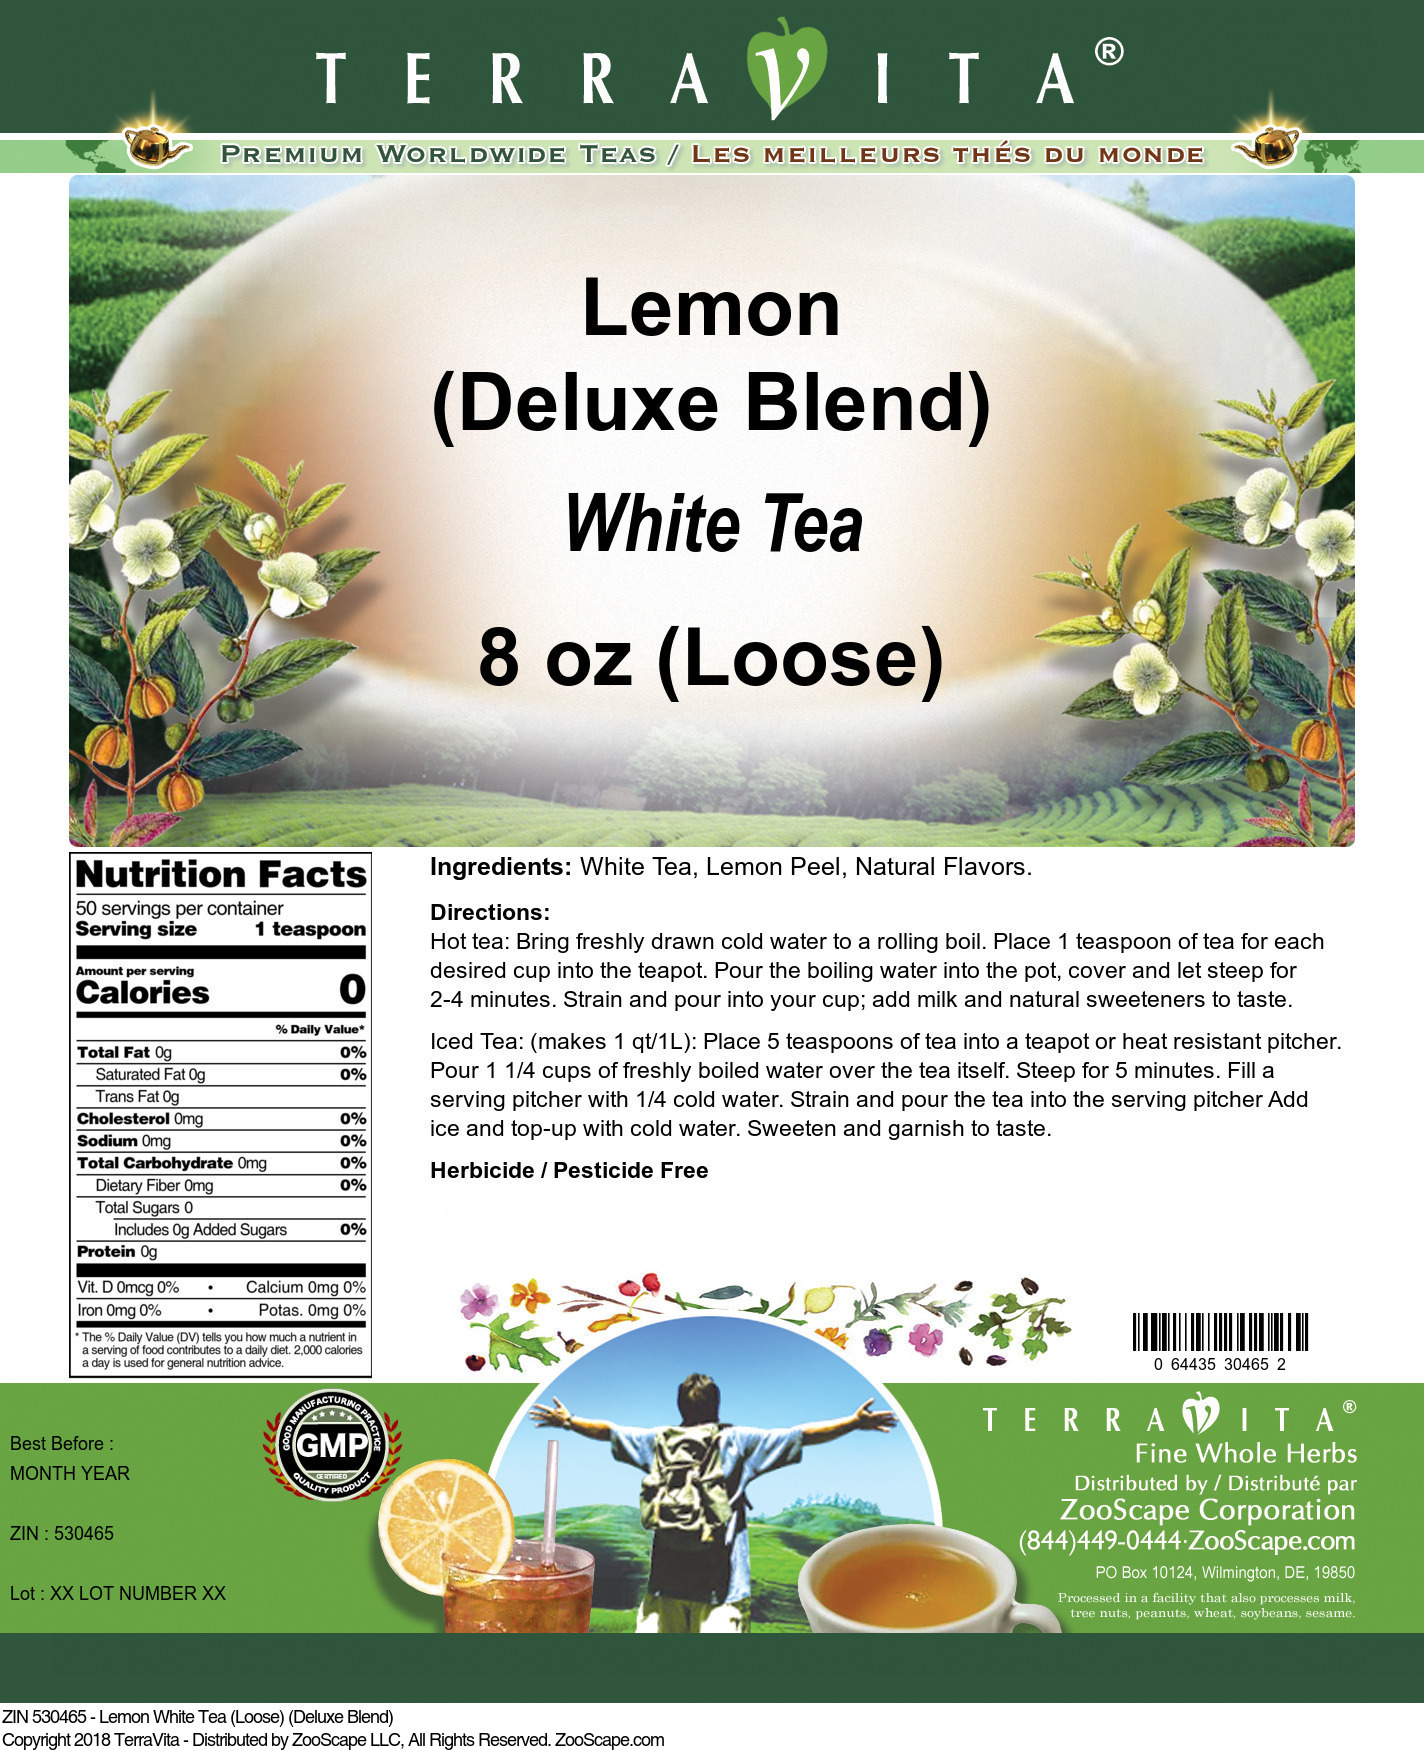 Lemon White Tea